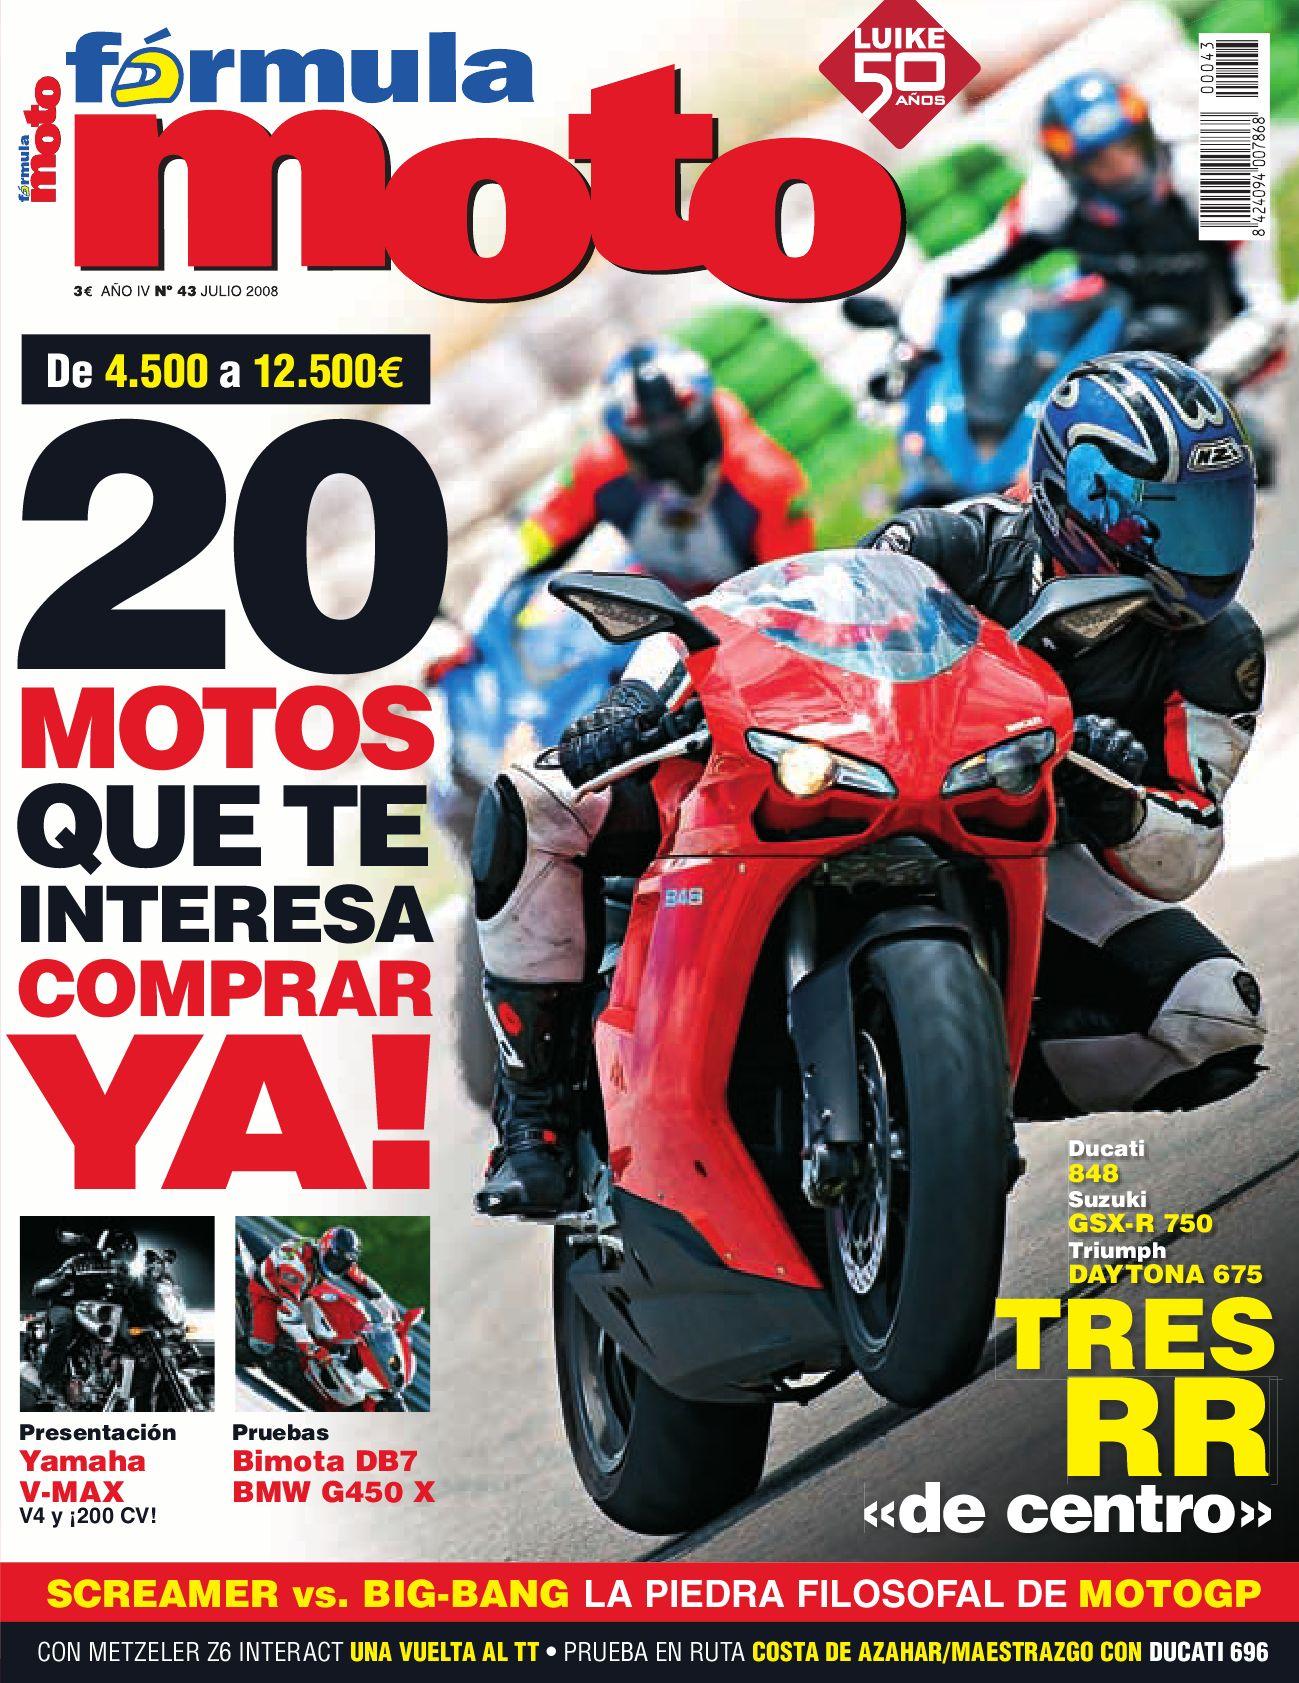 024f7689631 Fórmula Moto 43 by Jorge rguez - issuu